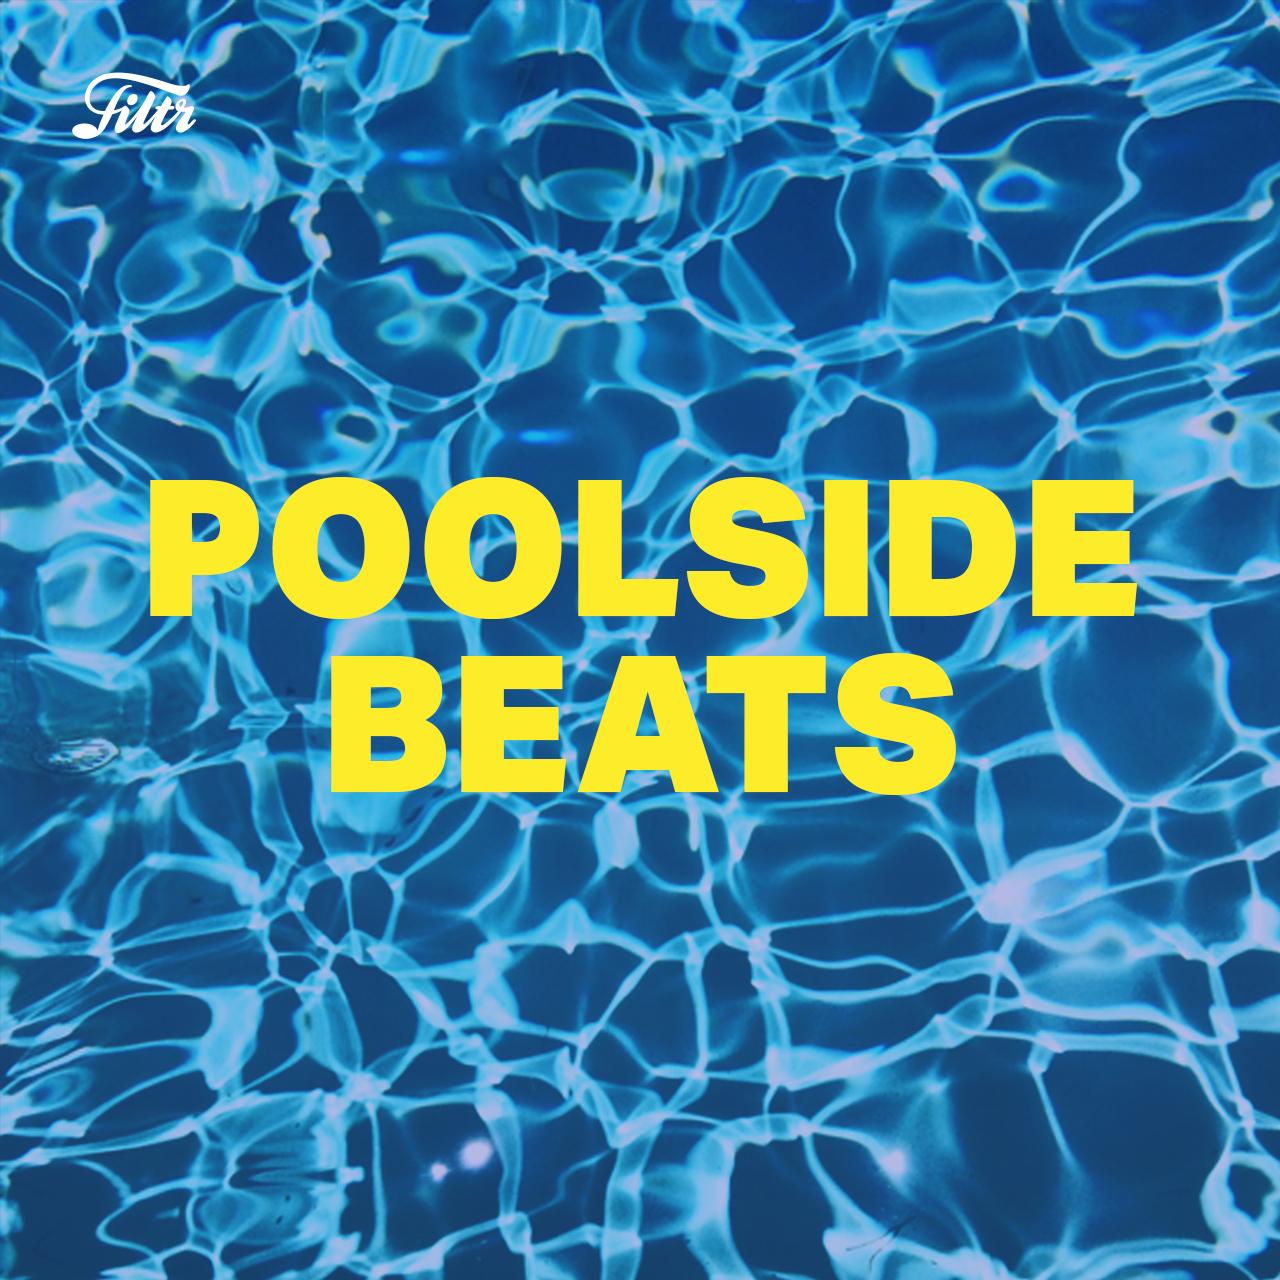 Poolside-Beats.jpg